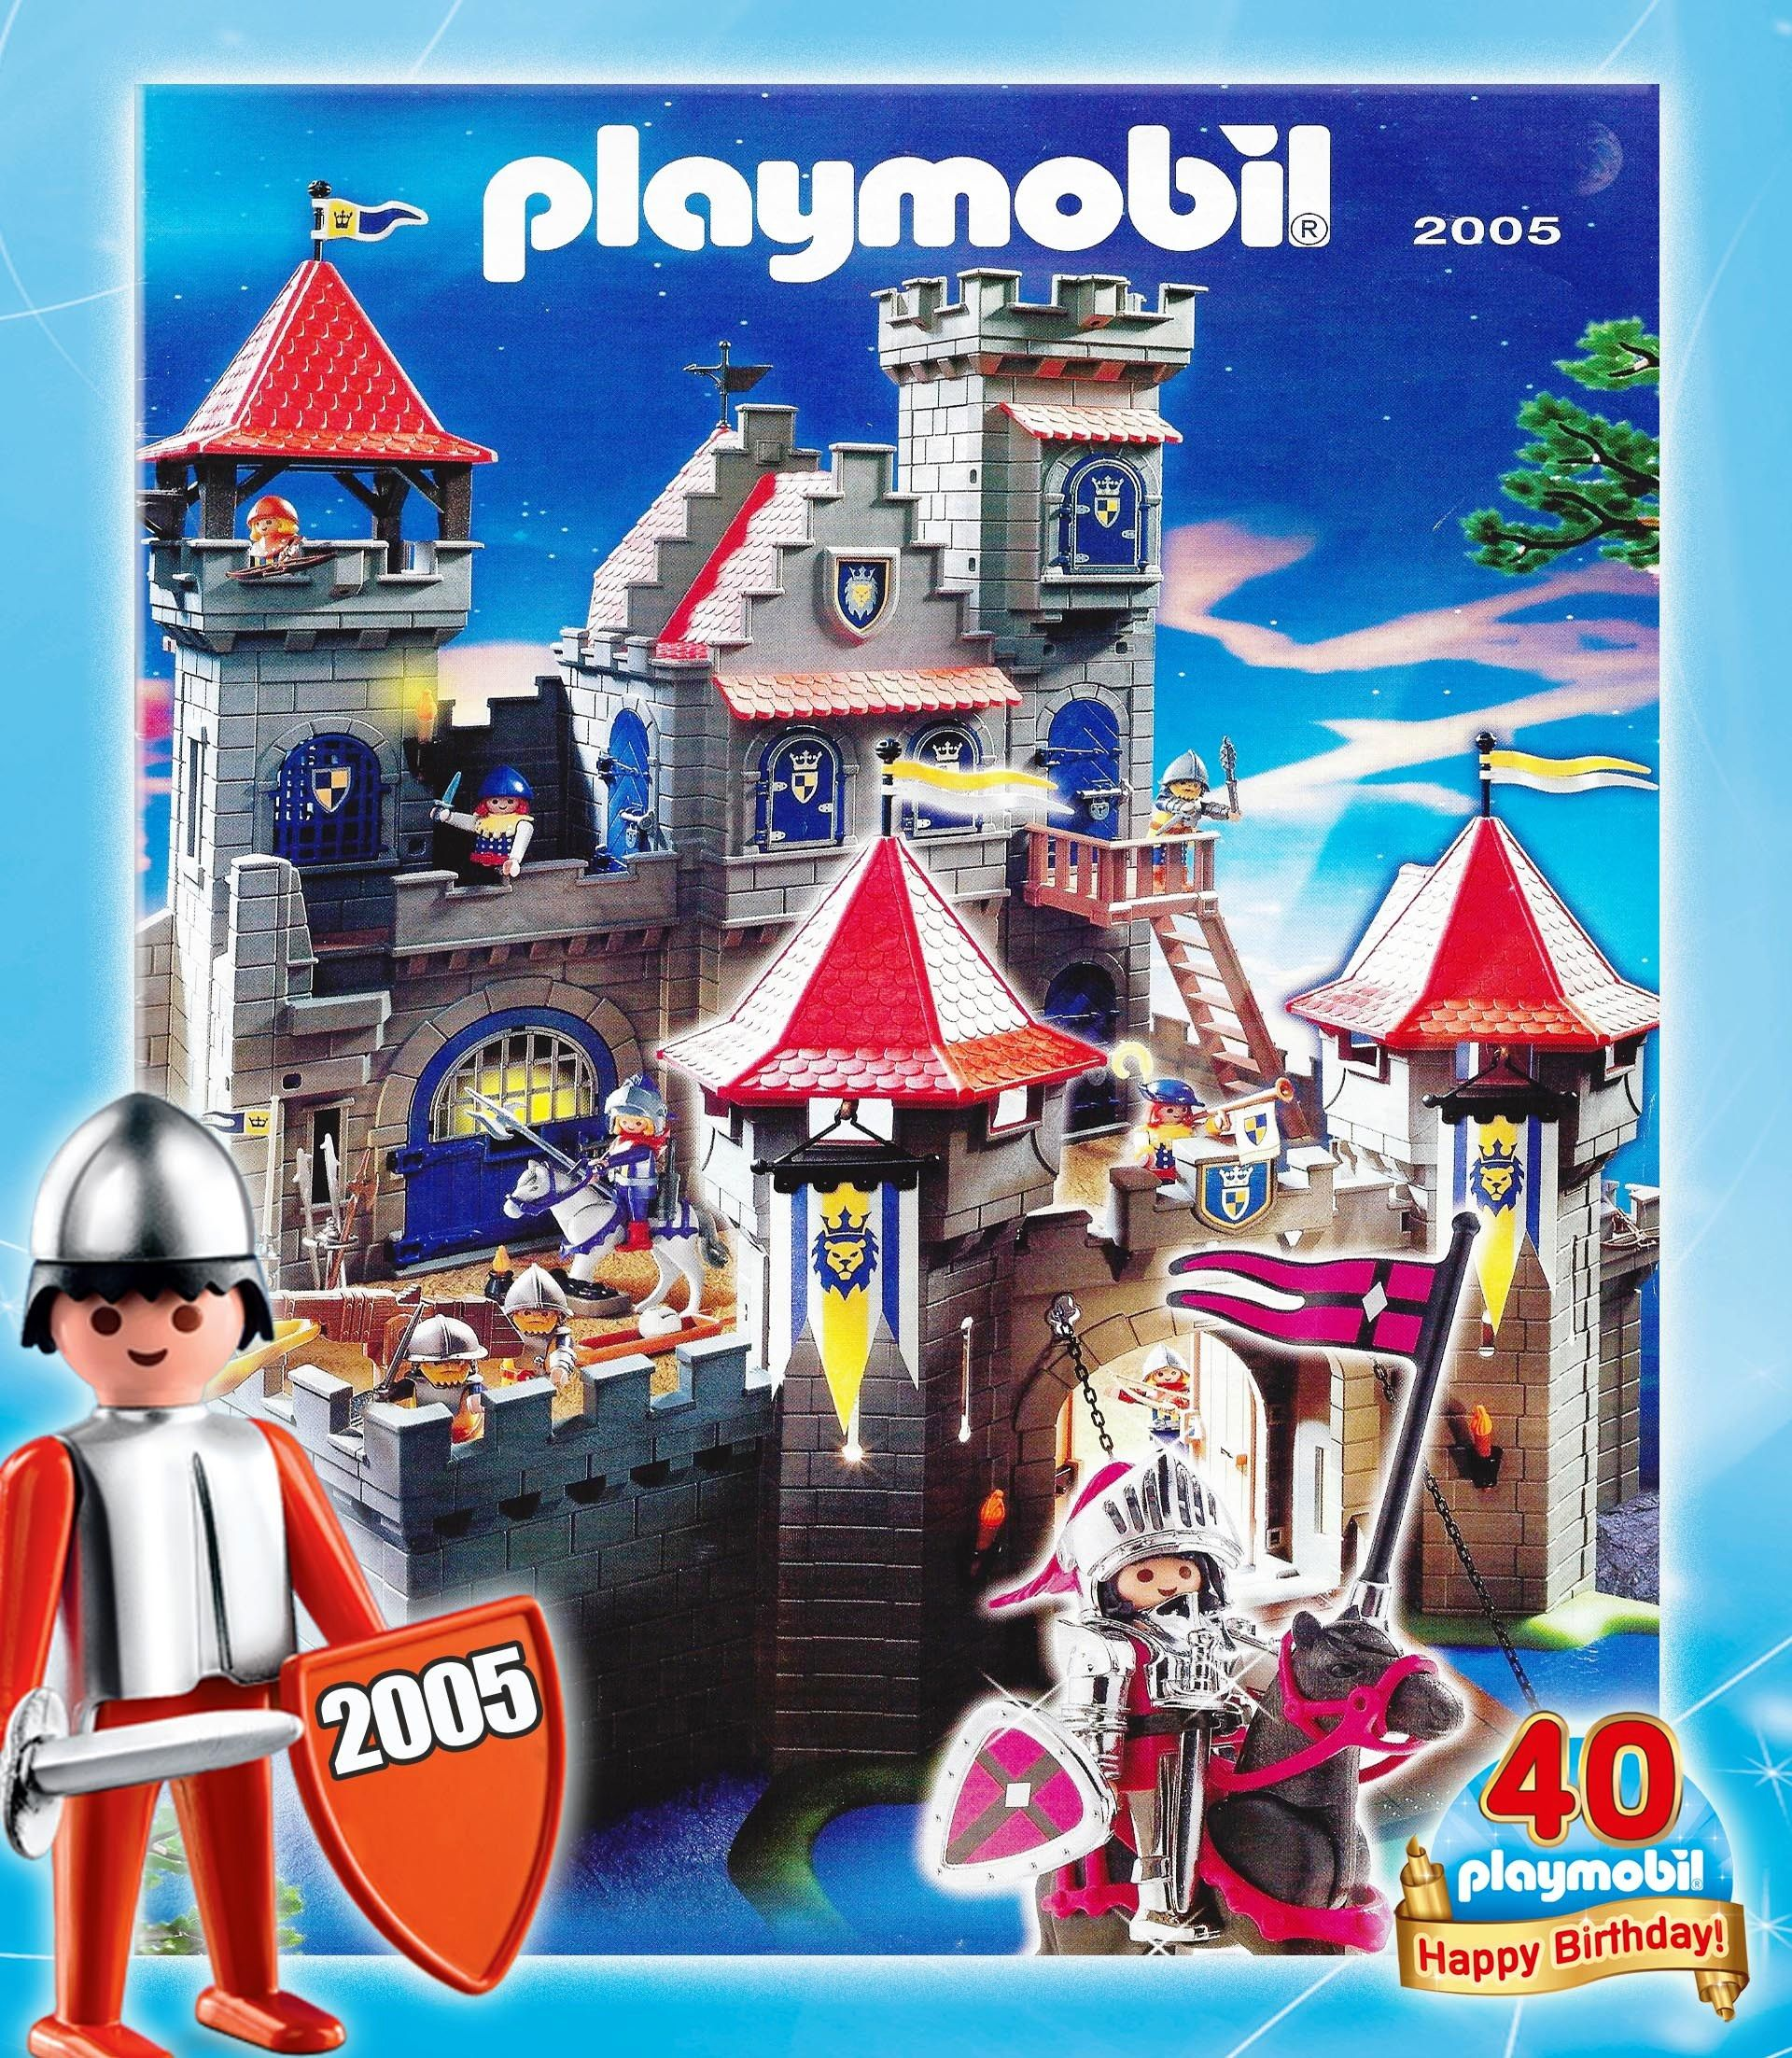 2005 playmobil 1974 2014 for Kinderzimmer playmobil